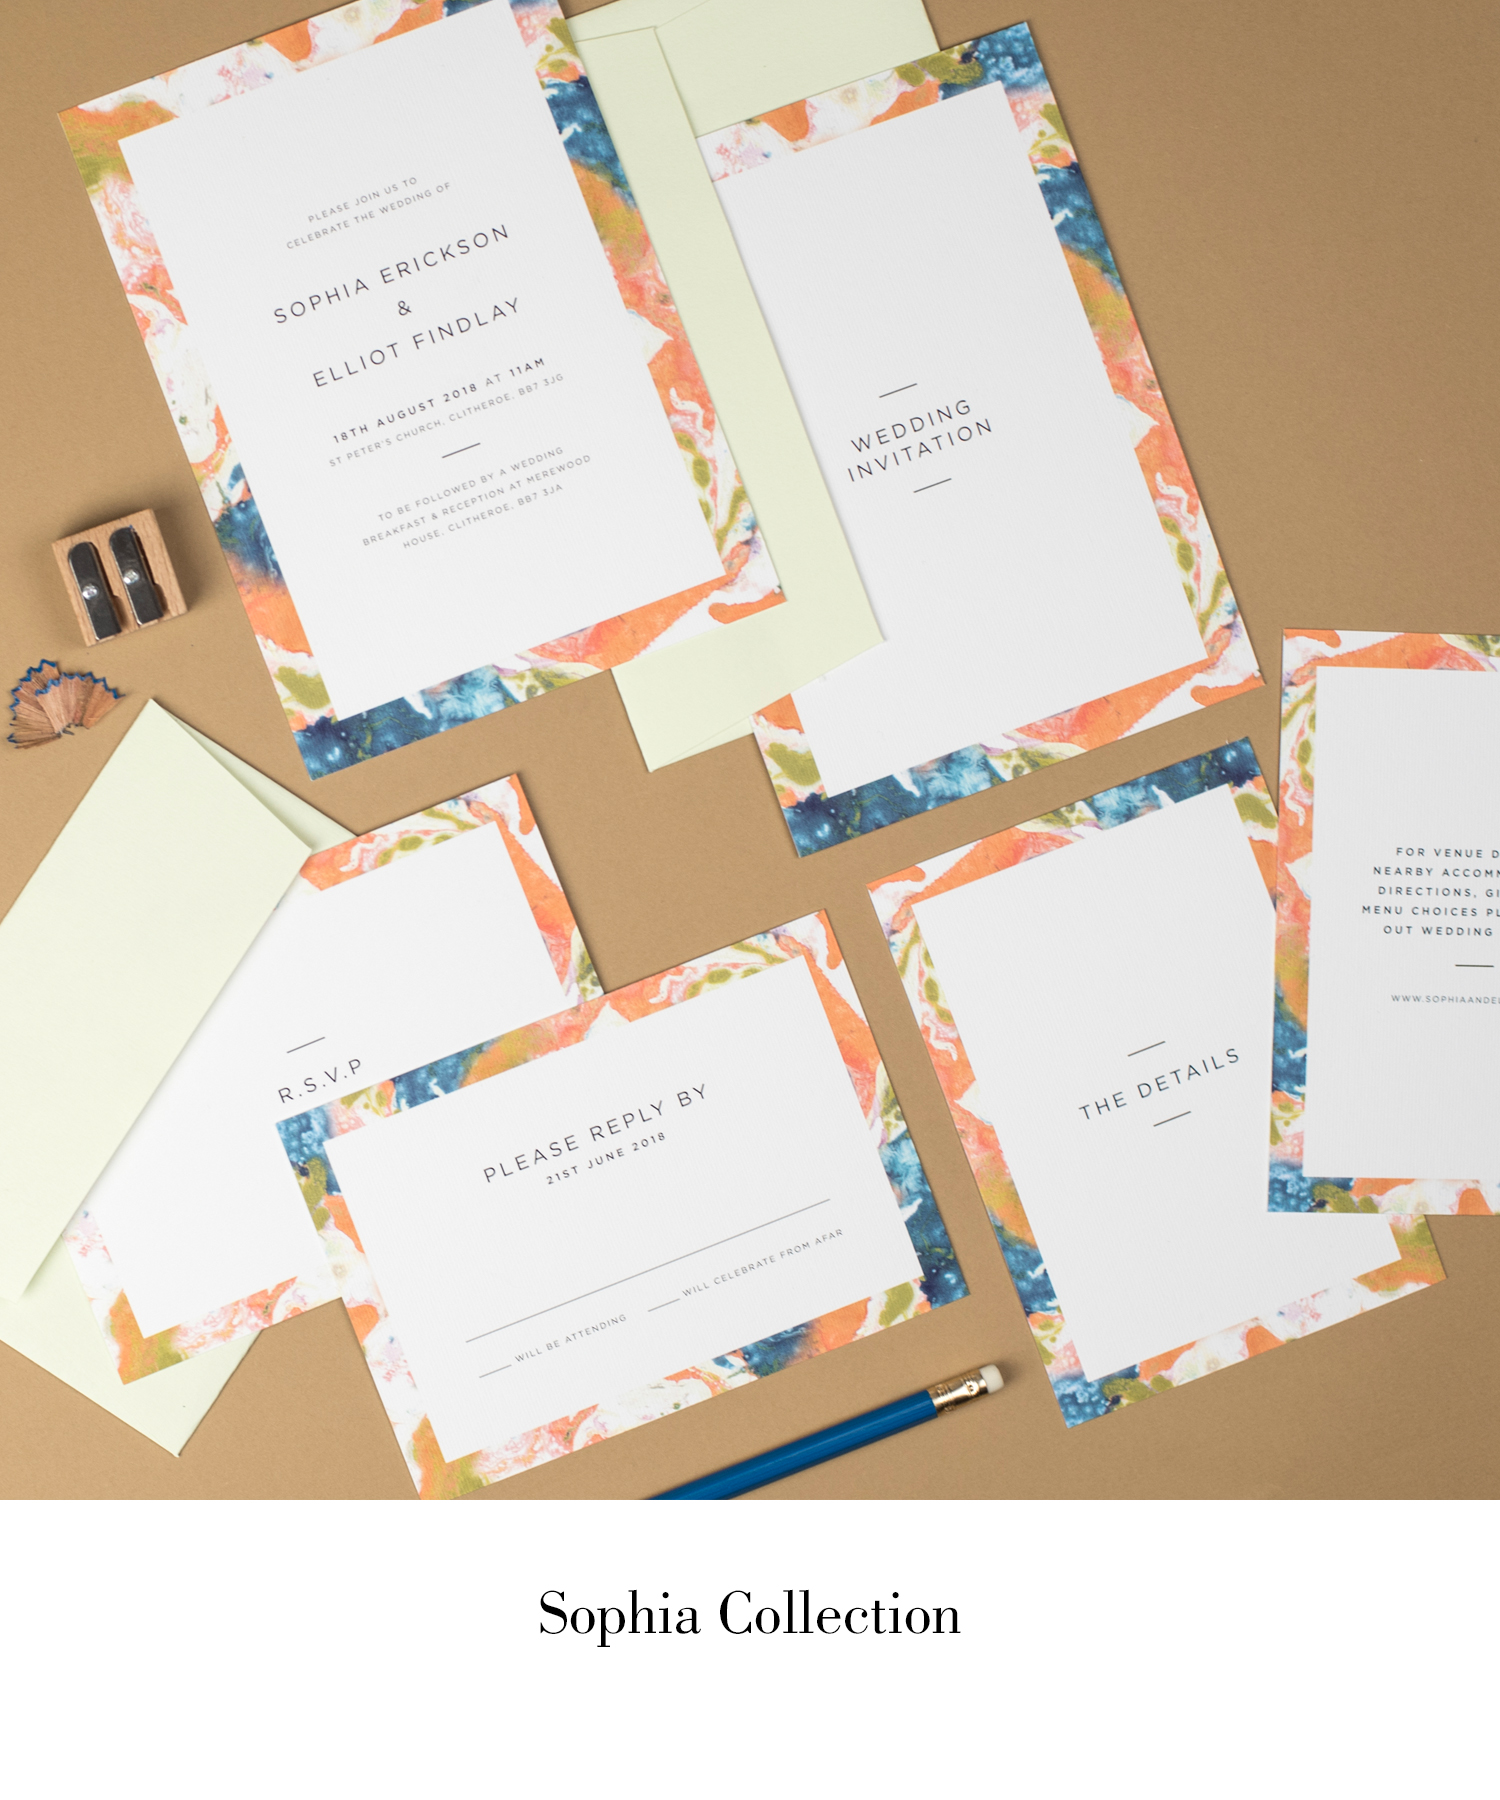 Sophia Collection.jpg